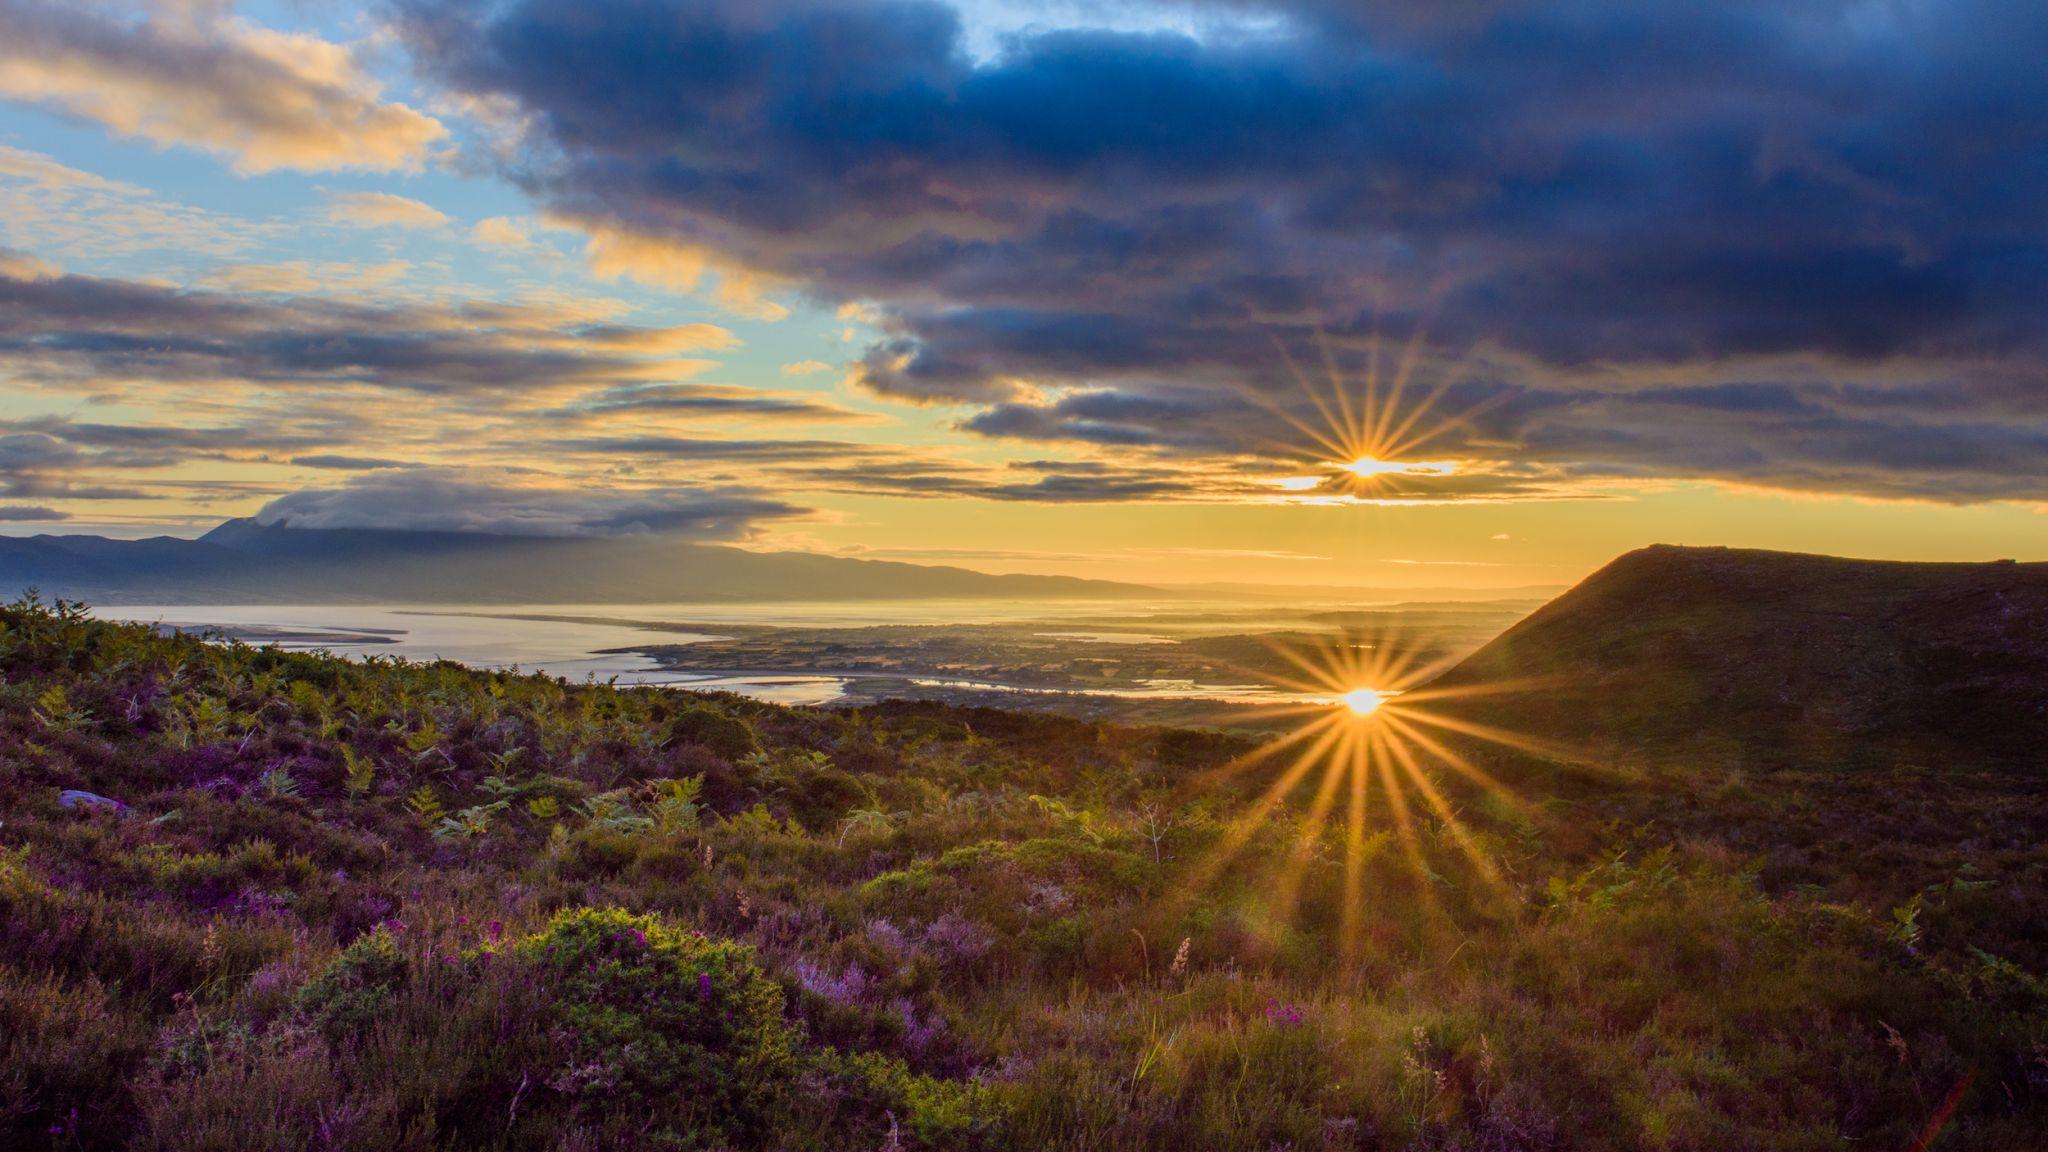 Sunrise over Castlemaine Harbour, Ireland